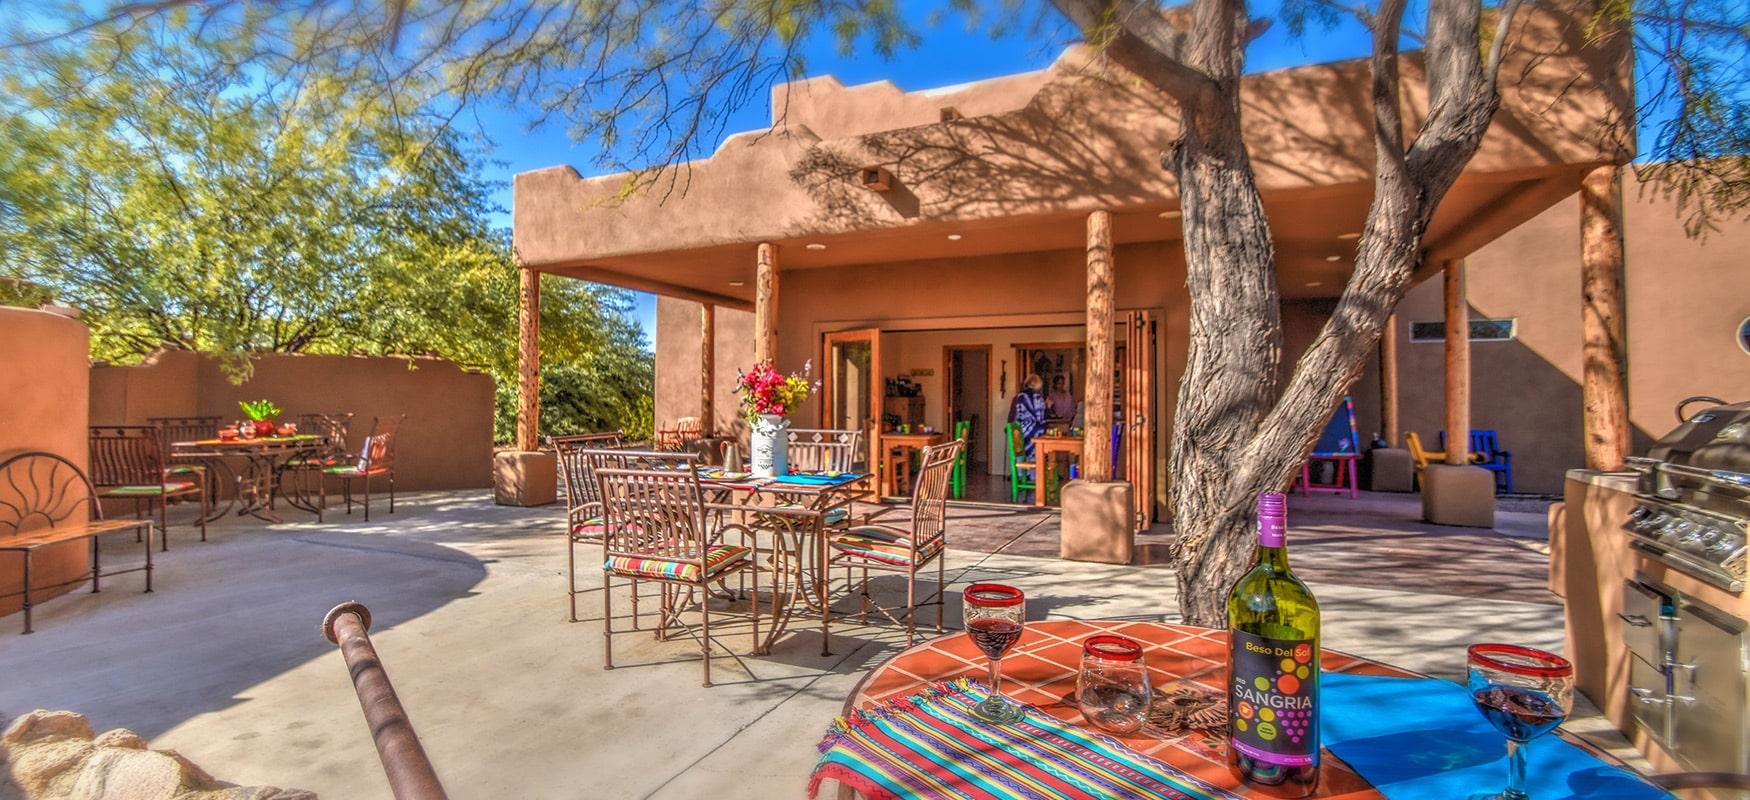 Saguaro Whispers patio